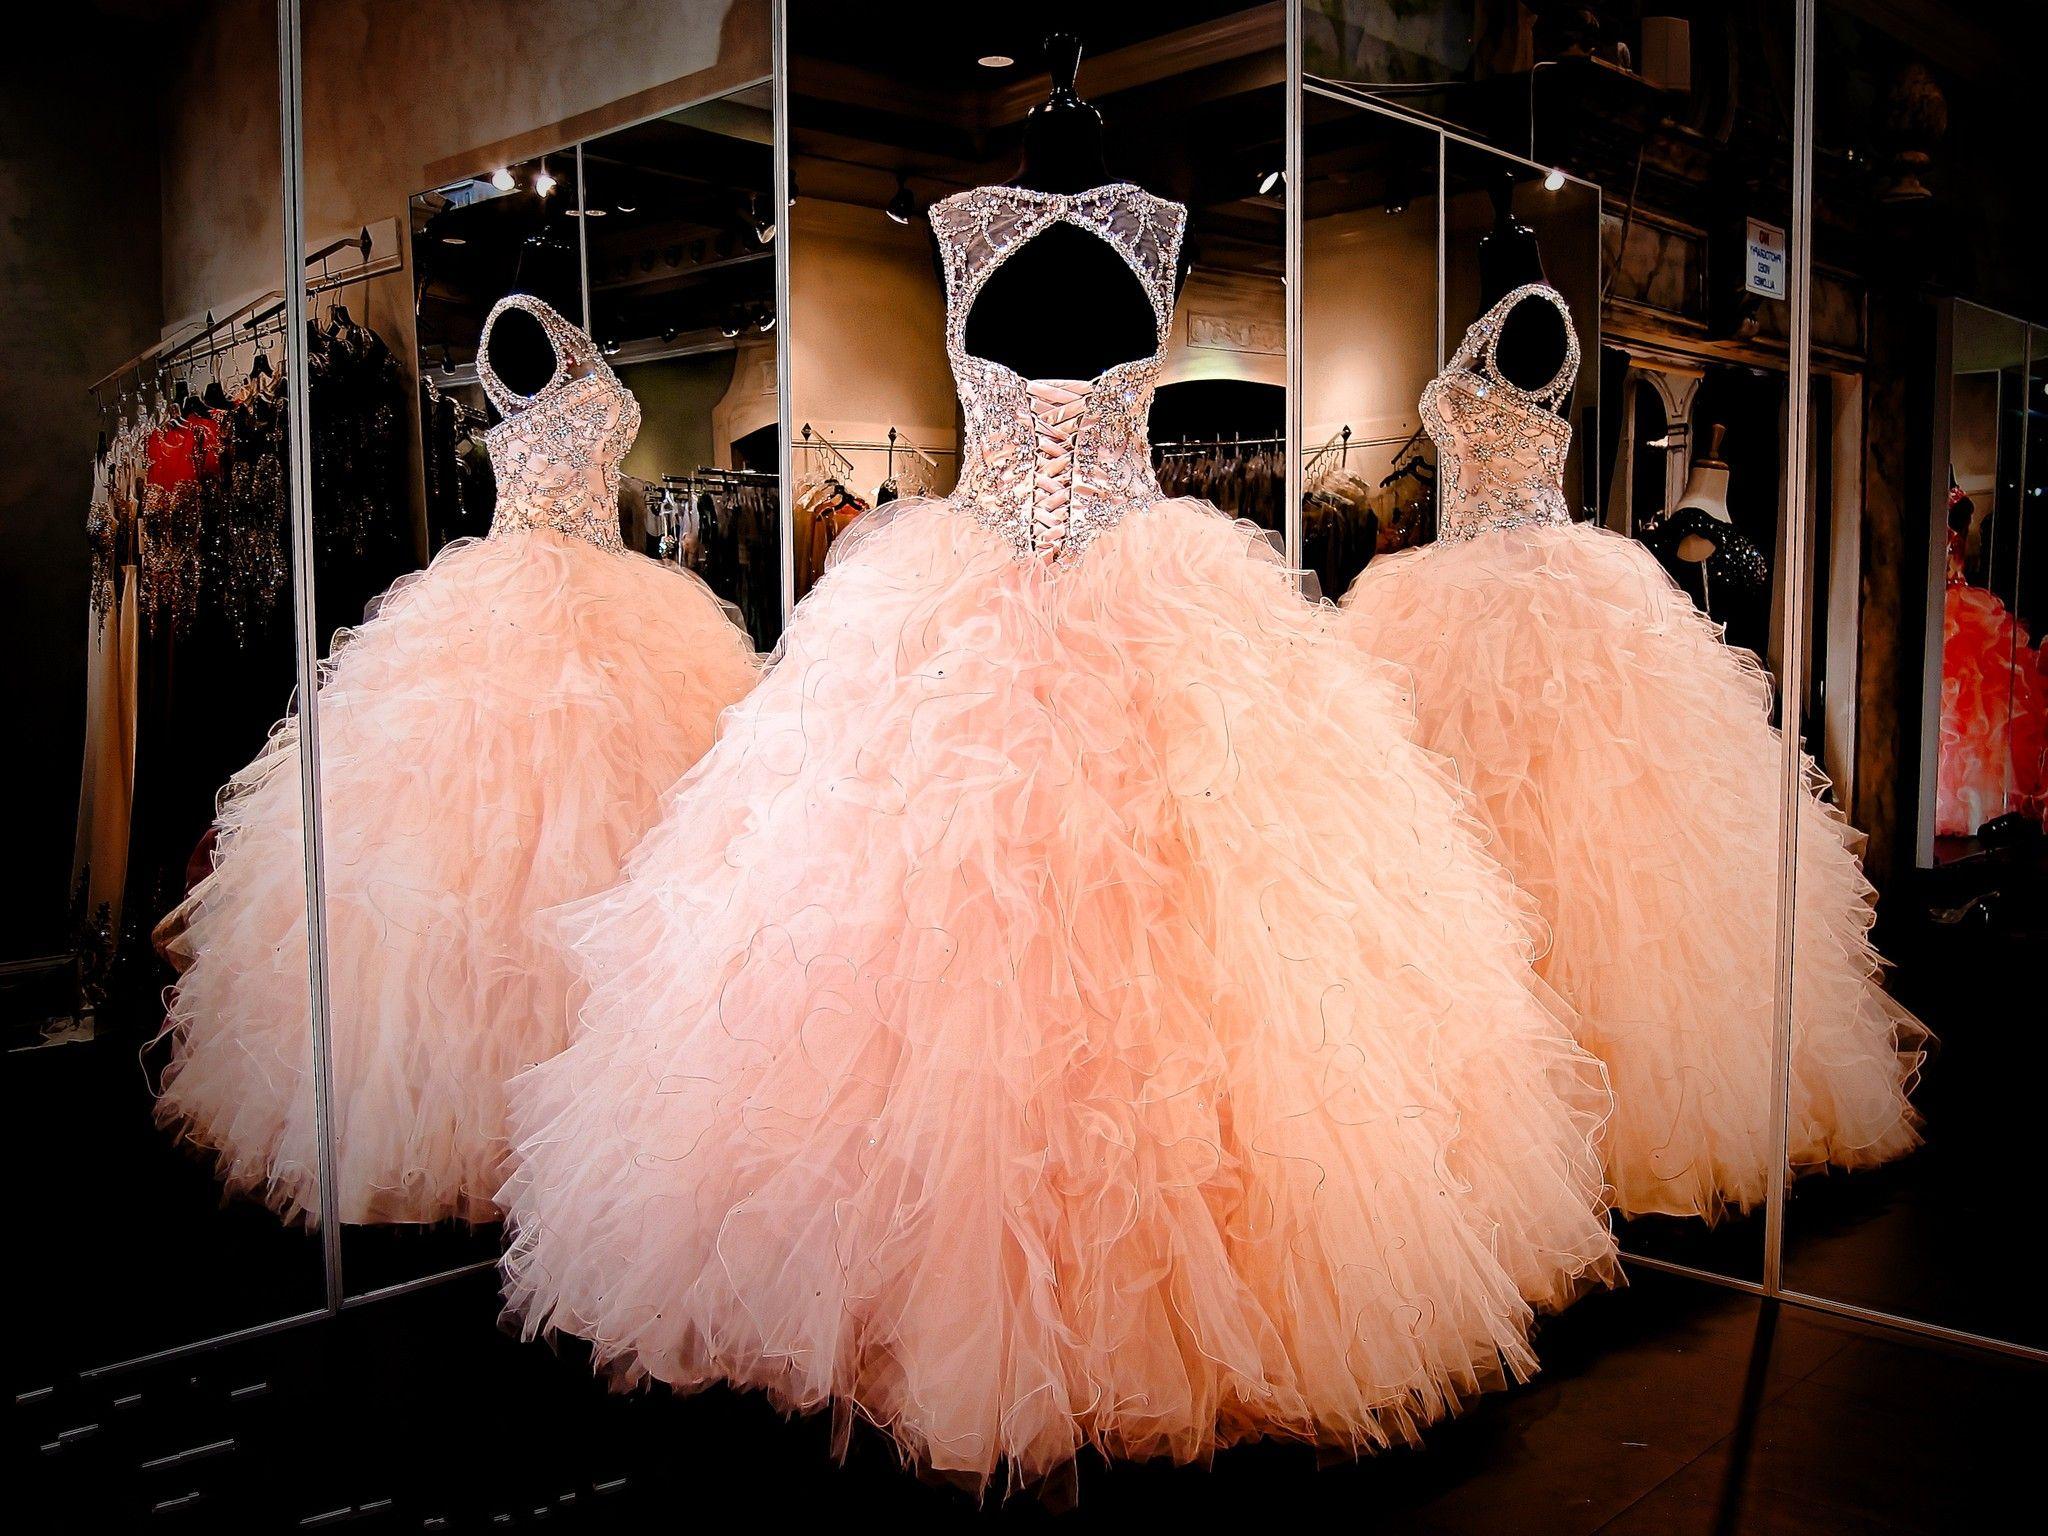 2017 Rhinestone Kristaller Allık Pembe Quinceanera Elbiseler Sheer Jewel Tatlı 16 Pageant Elbise Ruffles Etek Prenses Balo Abiye